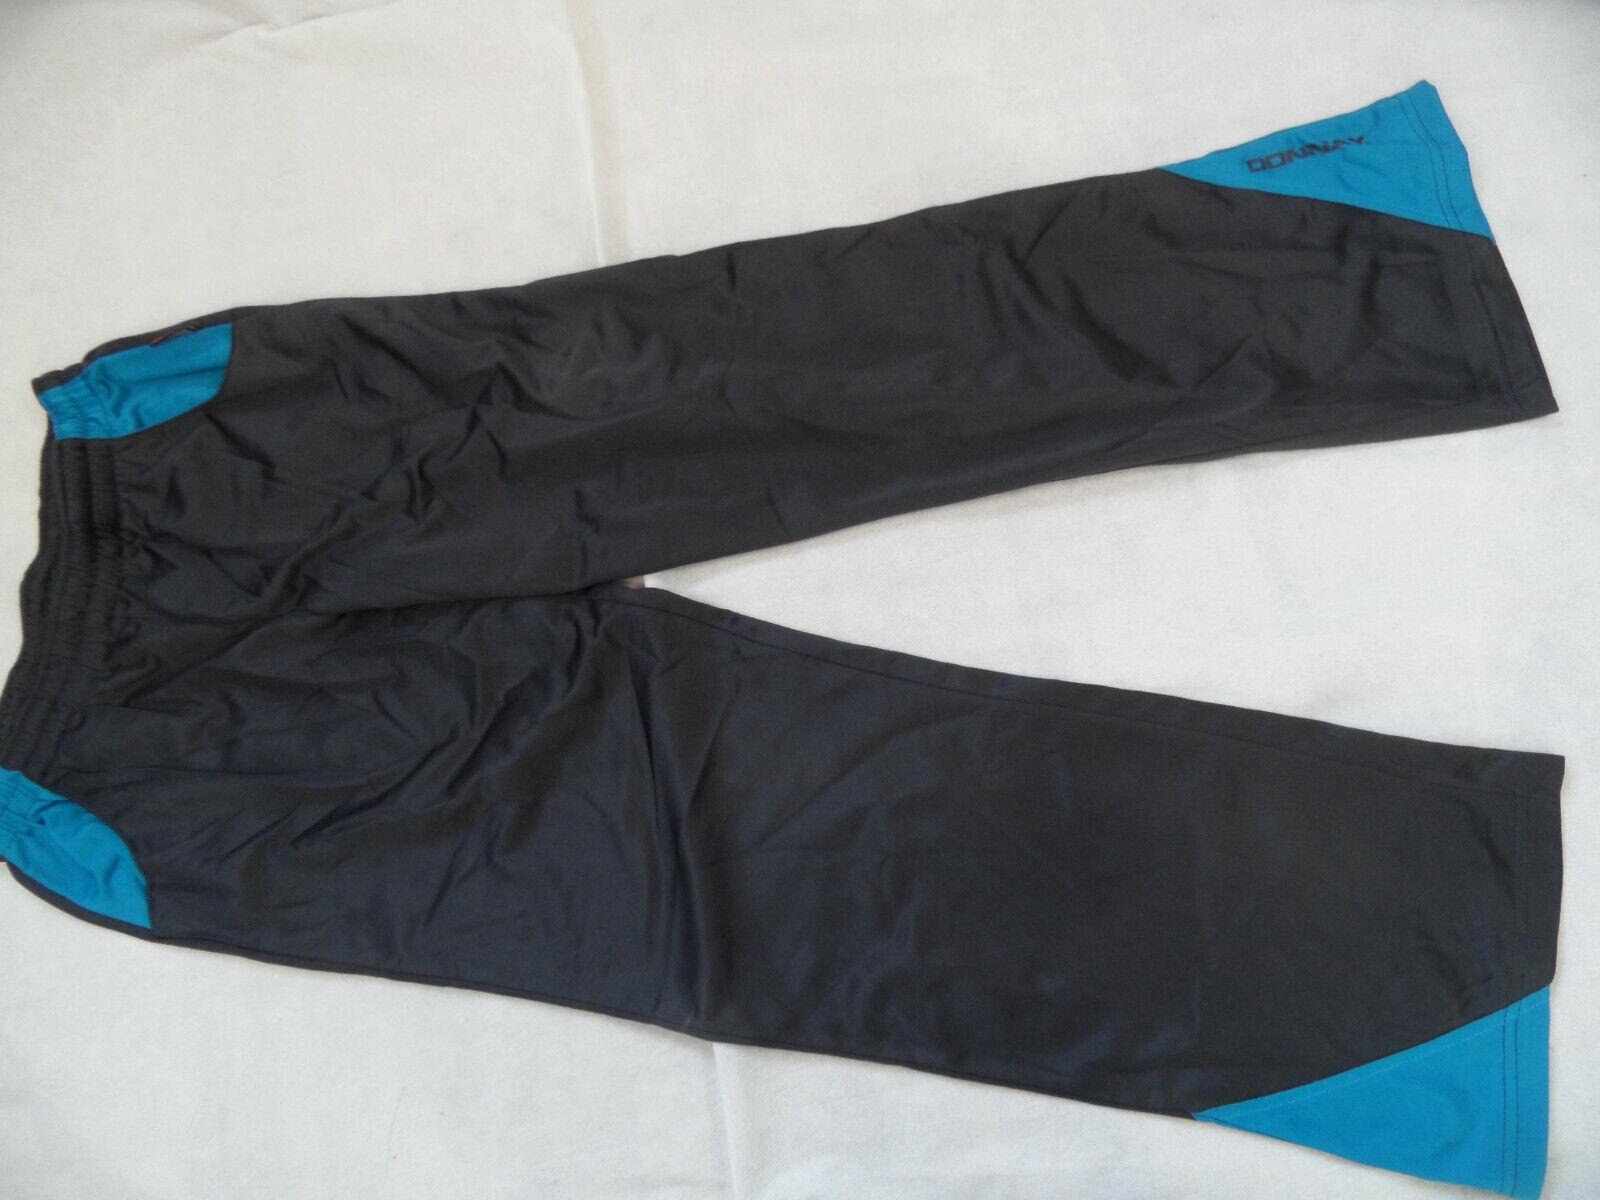 DONNAY schöne Sporthose grau türkis Gr. M TOP K320